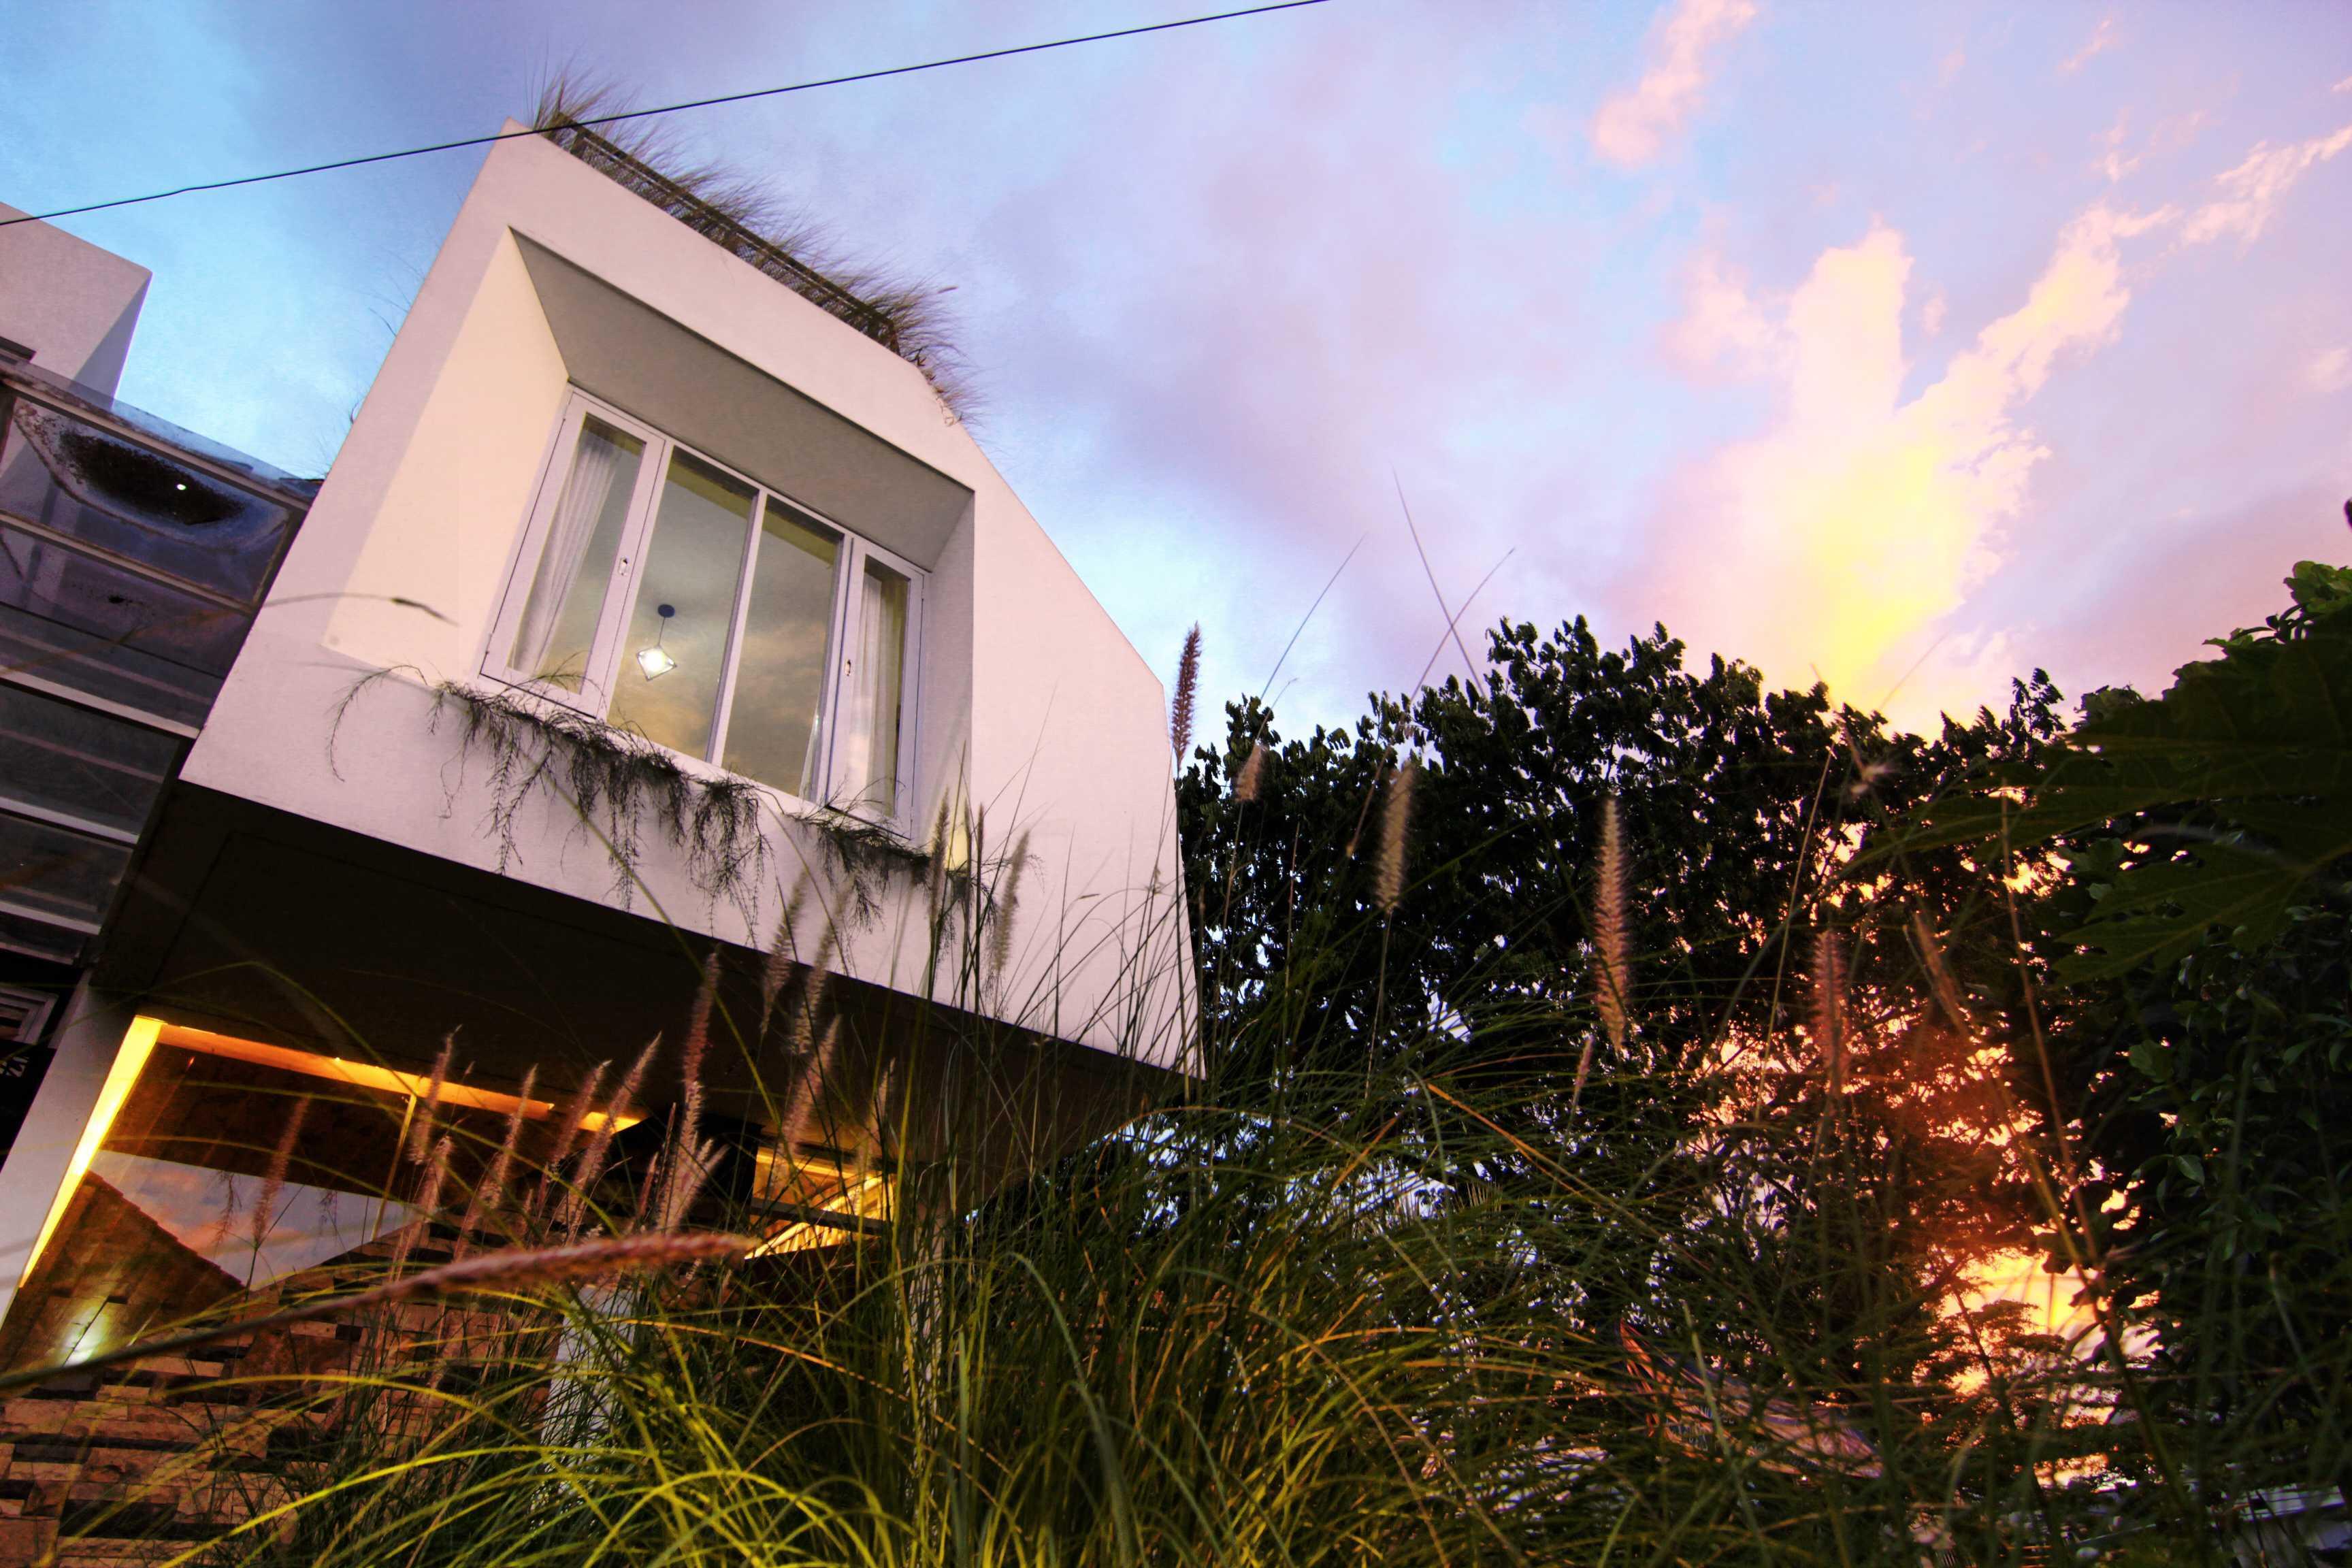 Mineli Architects Al House Baros, Cimahi Tengah, Kota Cimahi, Jawa Barat, Indonesia Baros, Cimahi Tengah, Kota Cimahi, Jawa Barat, Indonesia Facade View   45267